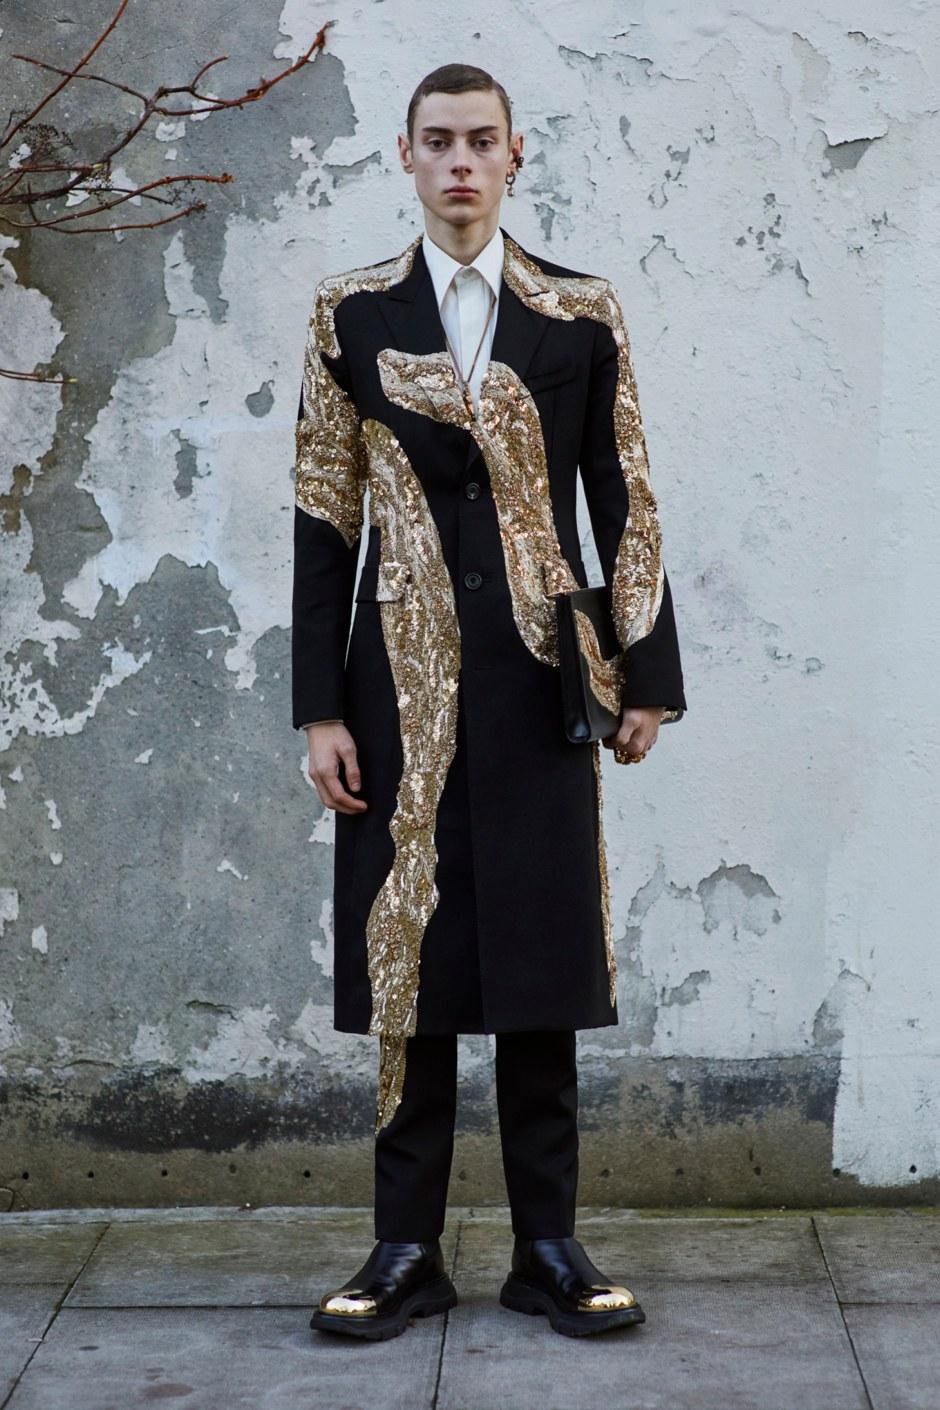 00046-Alexander-McQueen-Menswear-Fall-2020